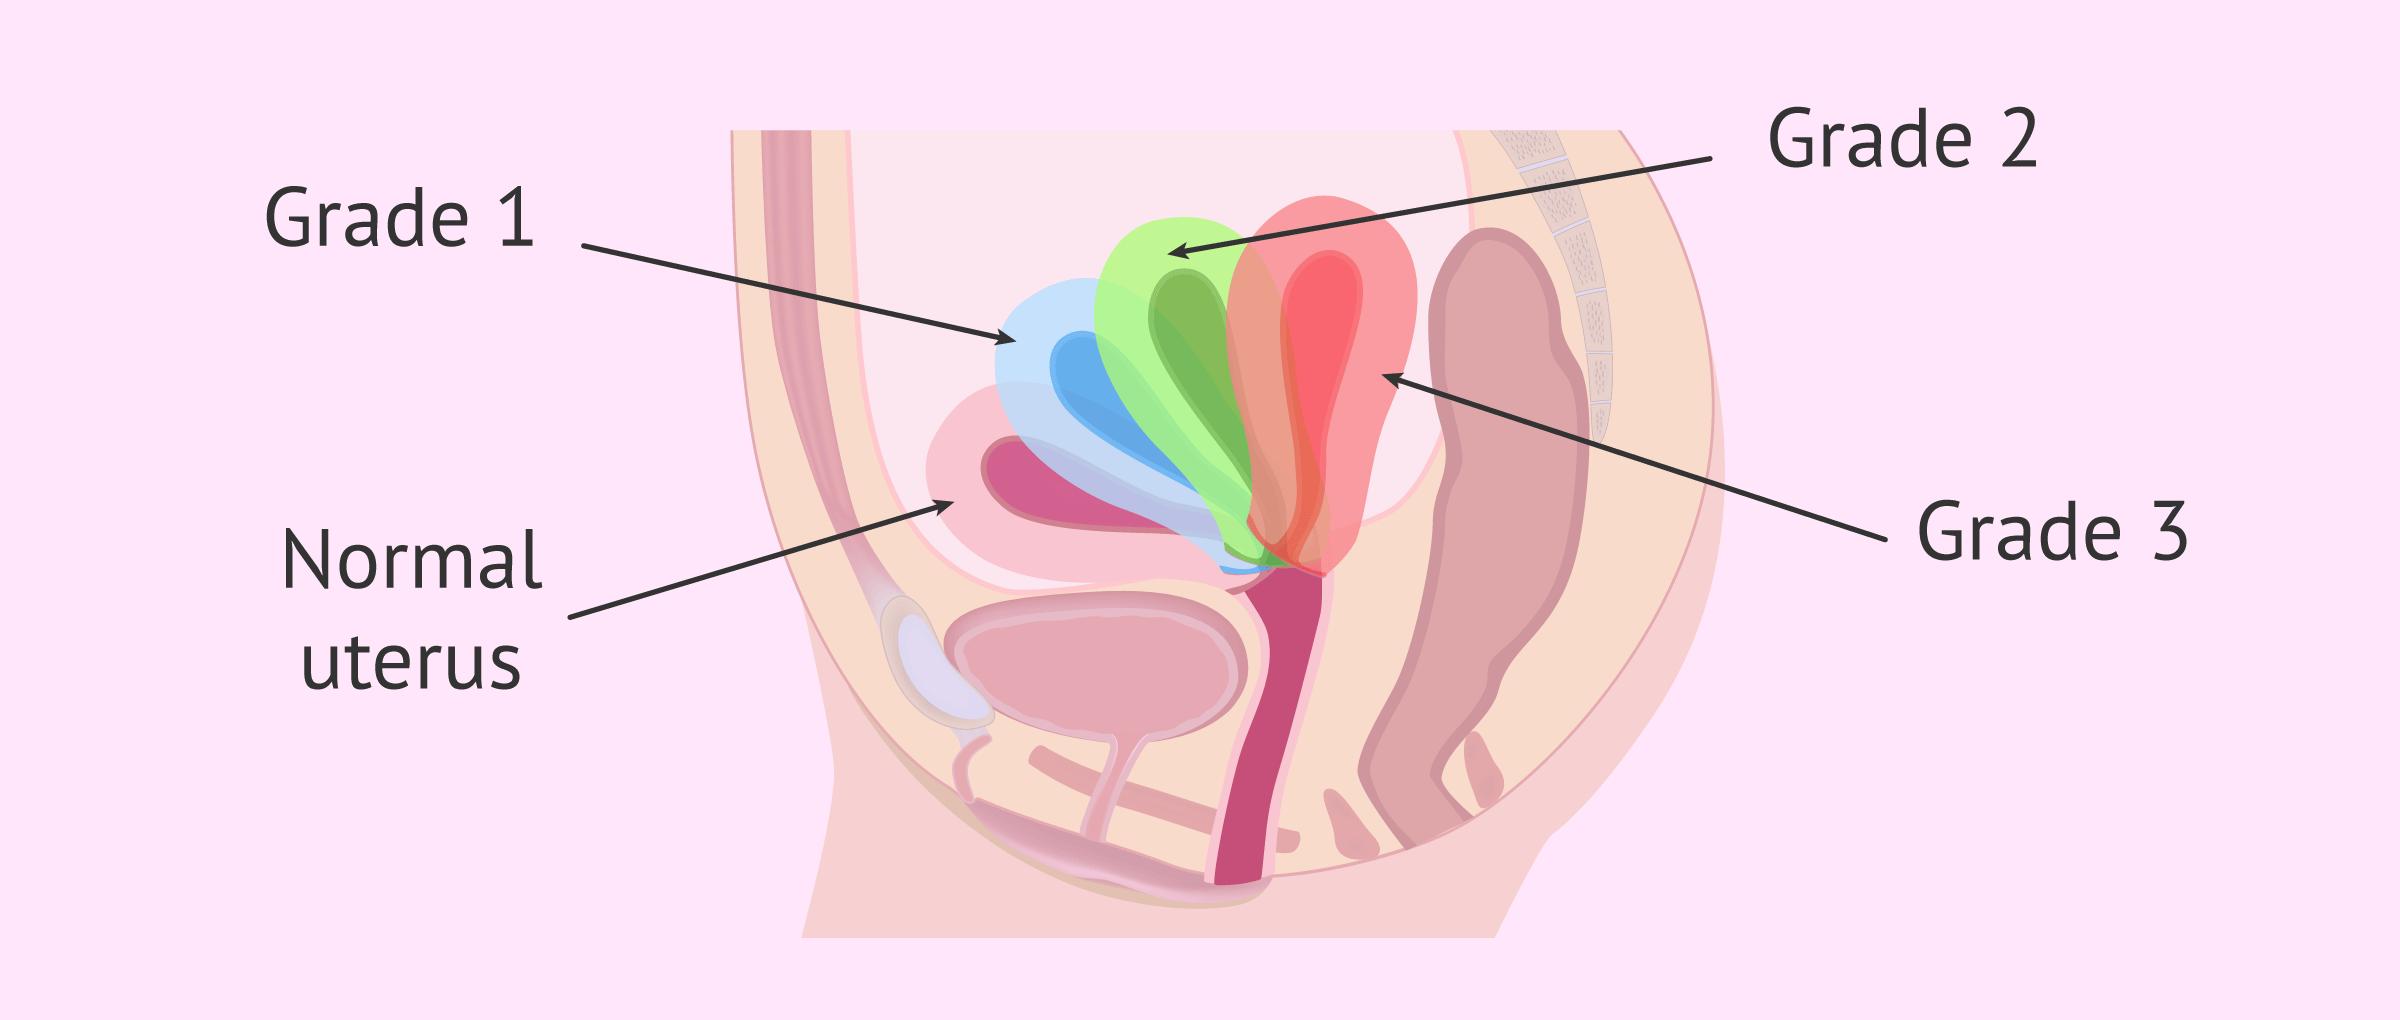 grades of tipped uterus